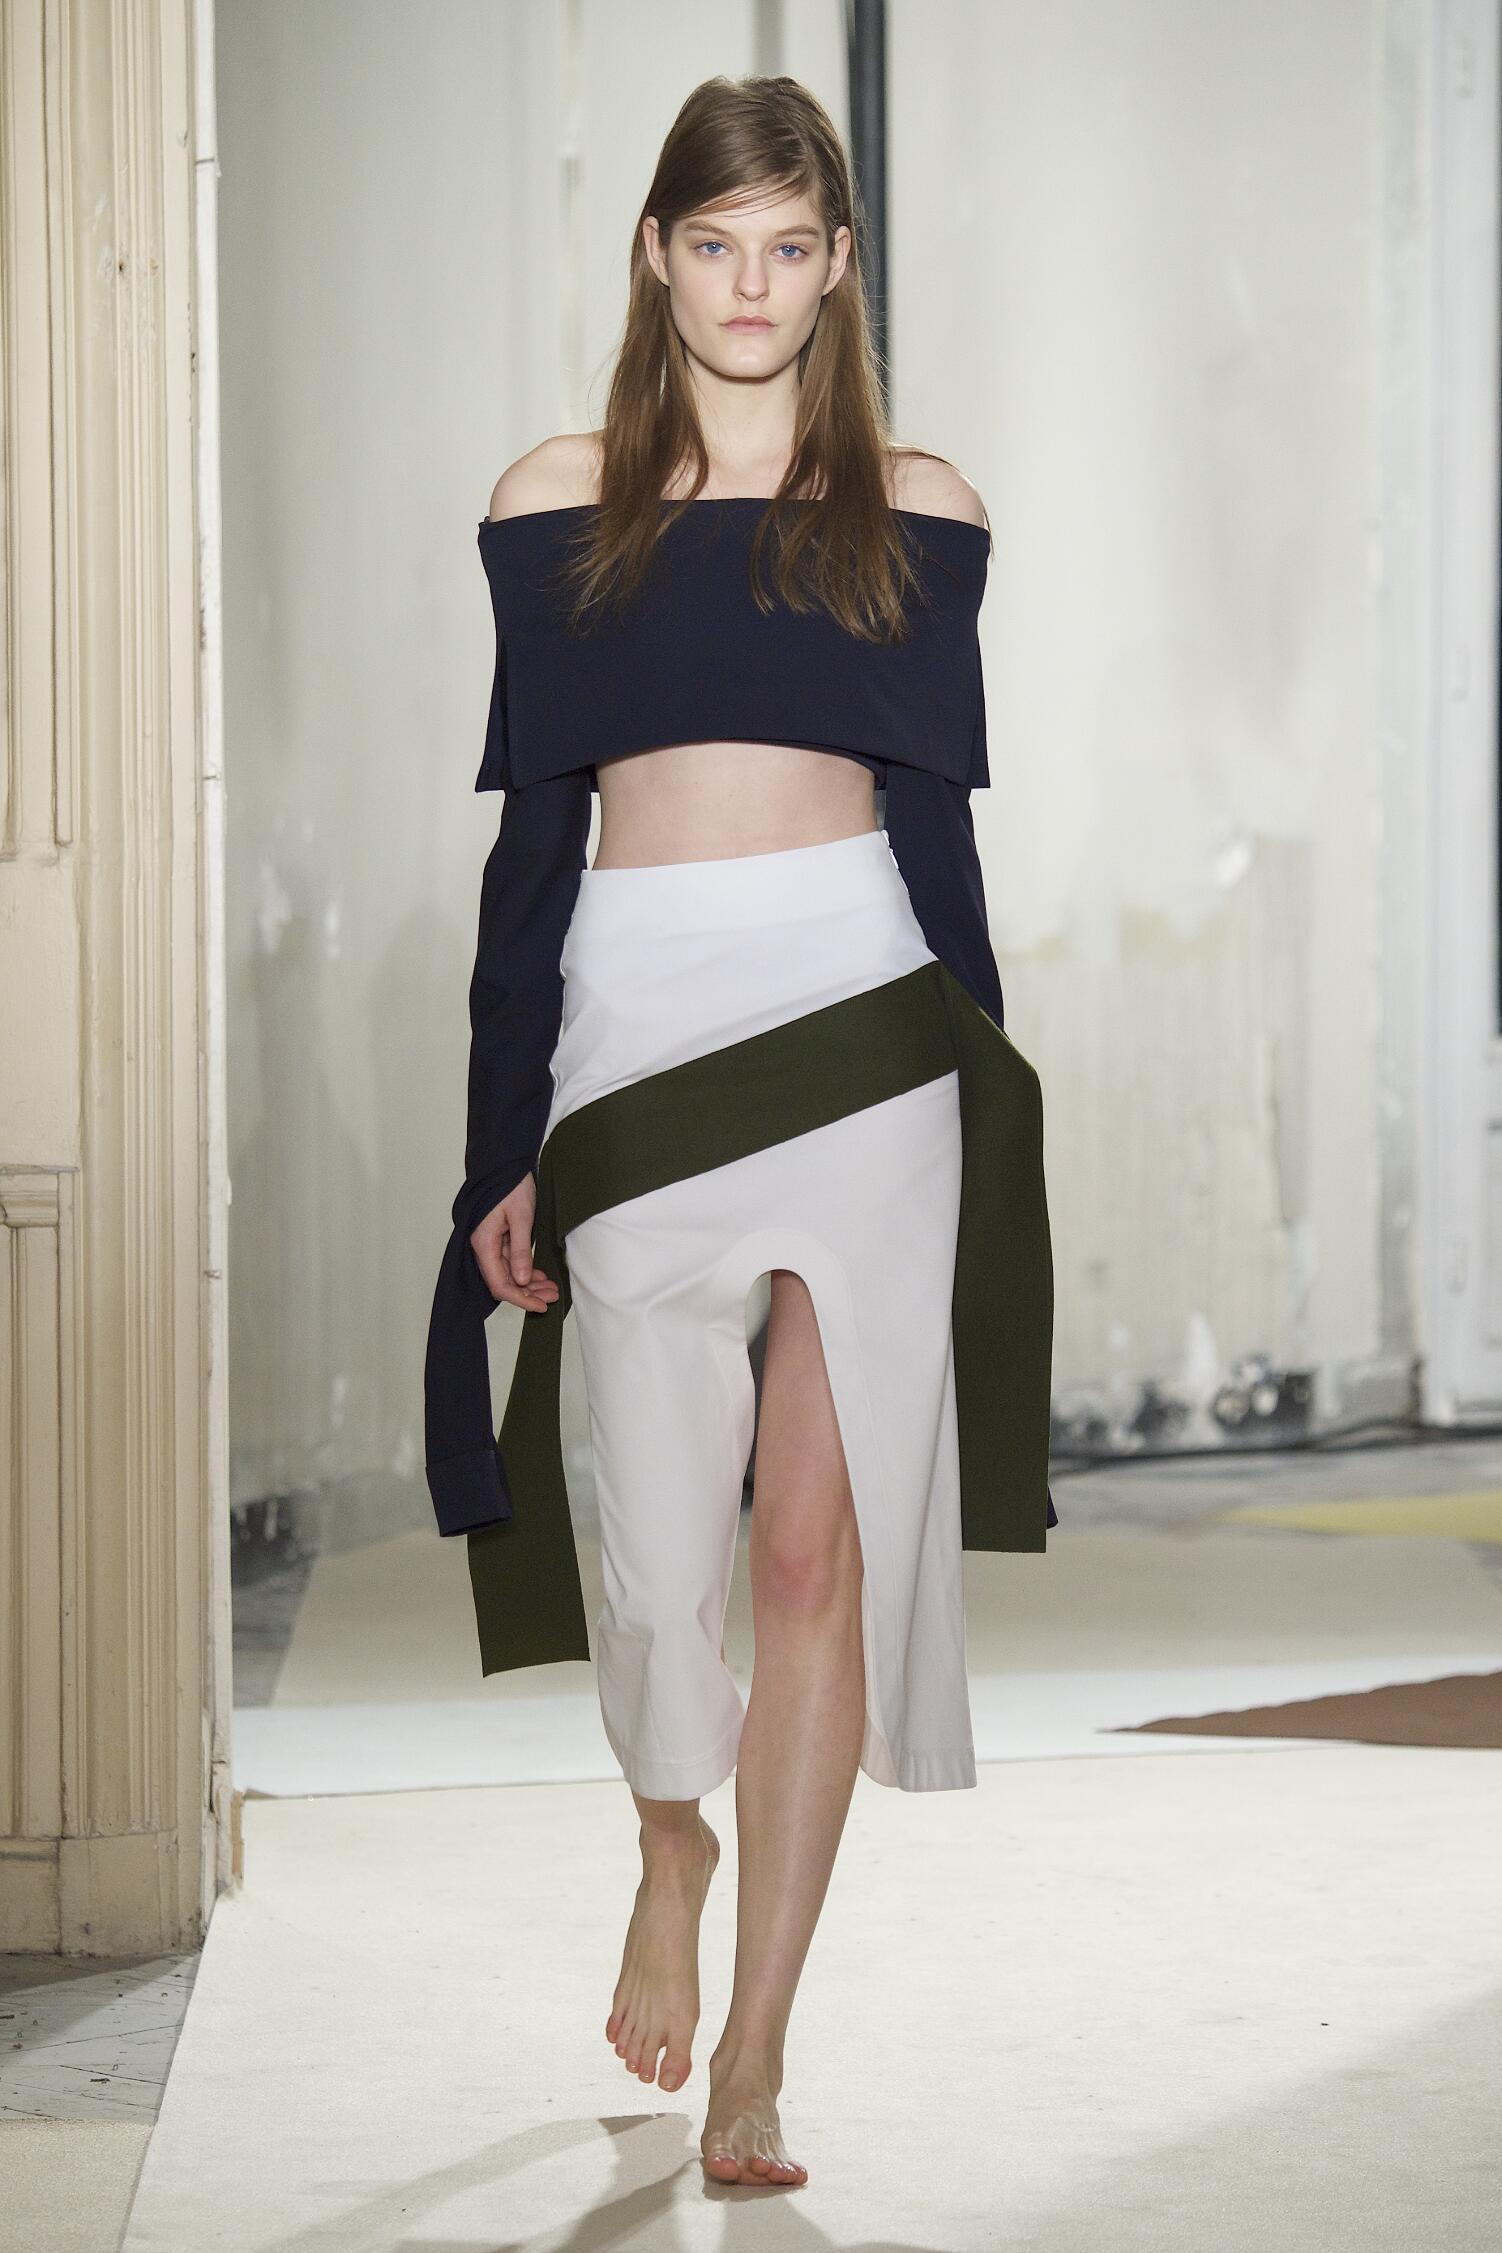 Runway Jacquemus Fall Winter 2015 16 Women's Collection Paris Fashion Week